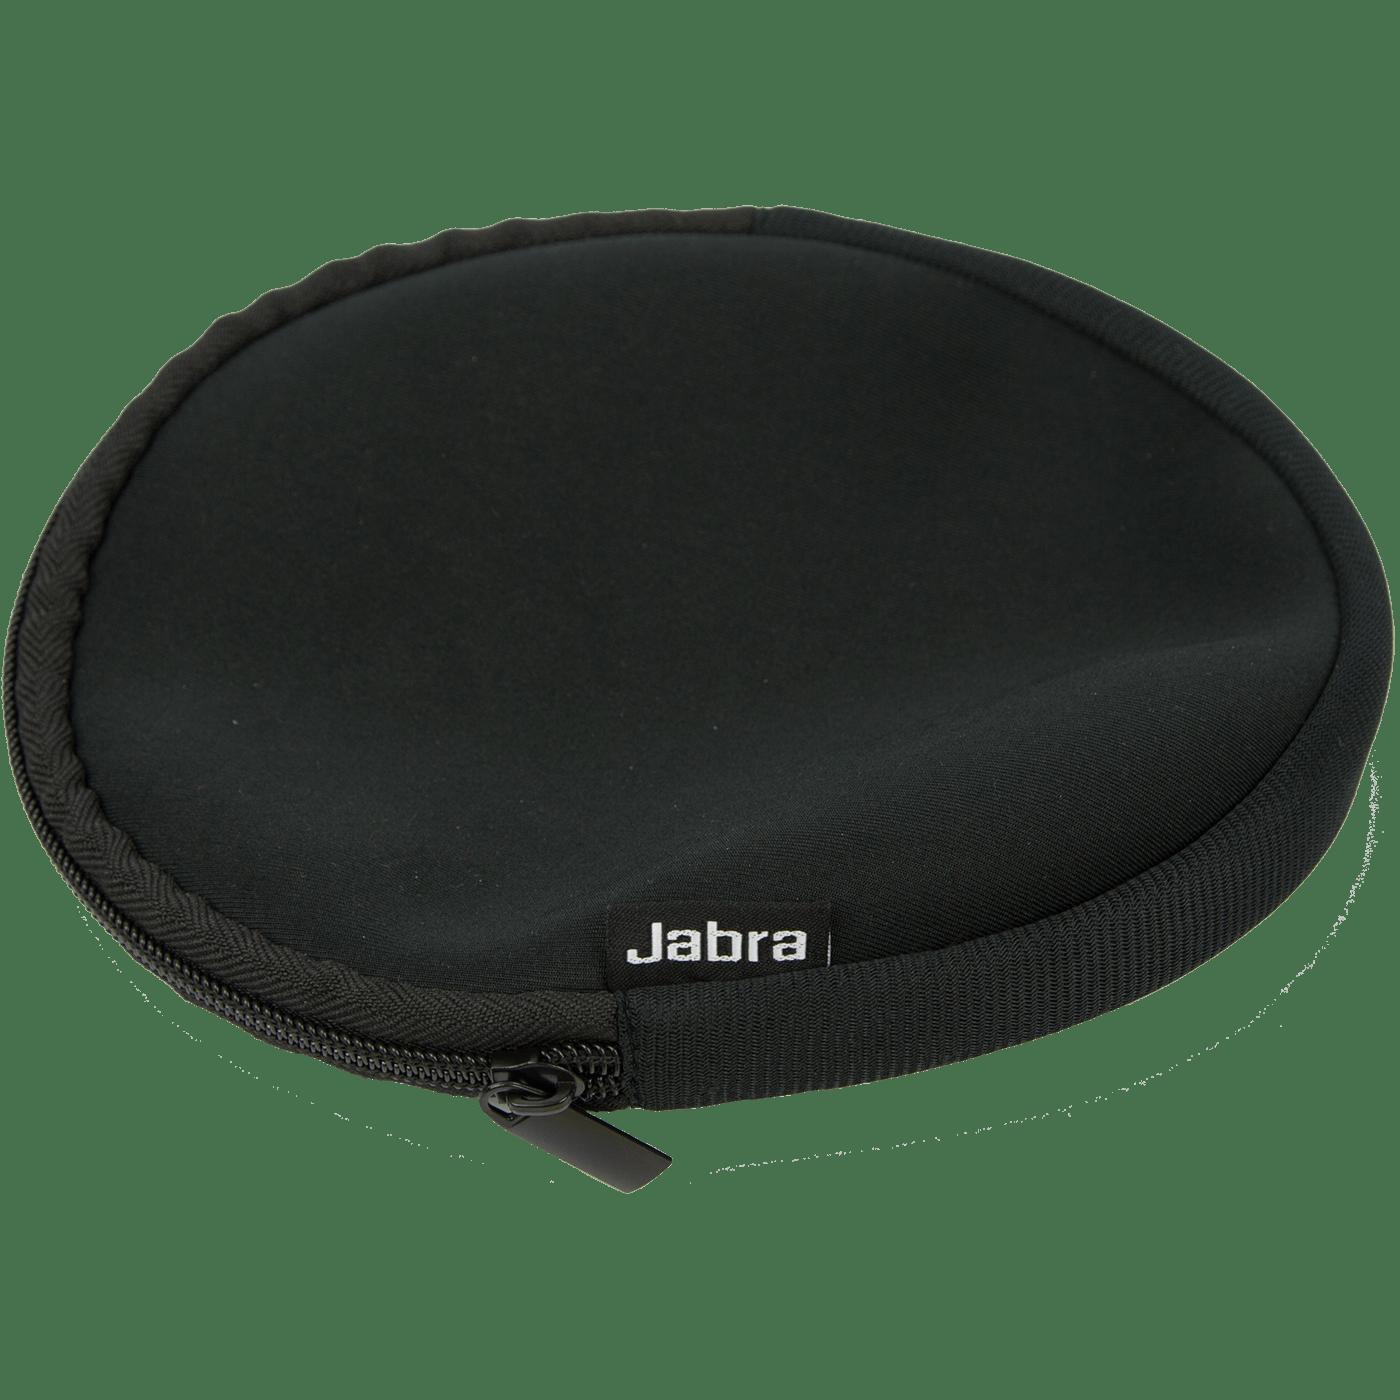 Jabra Neoprene Pouch